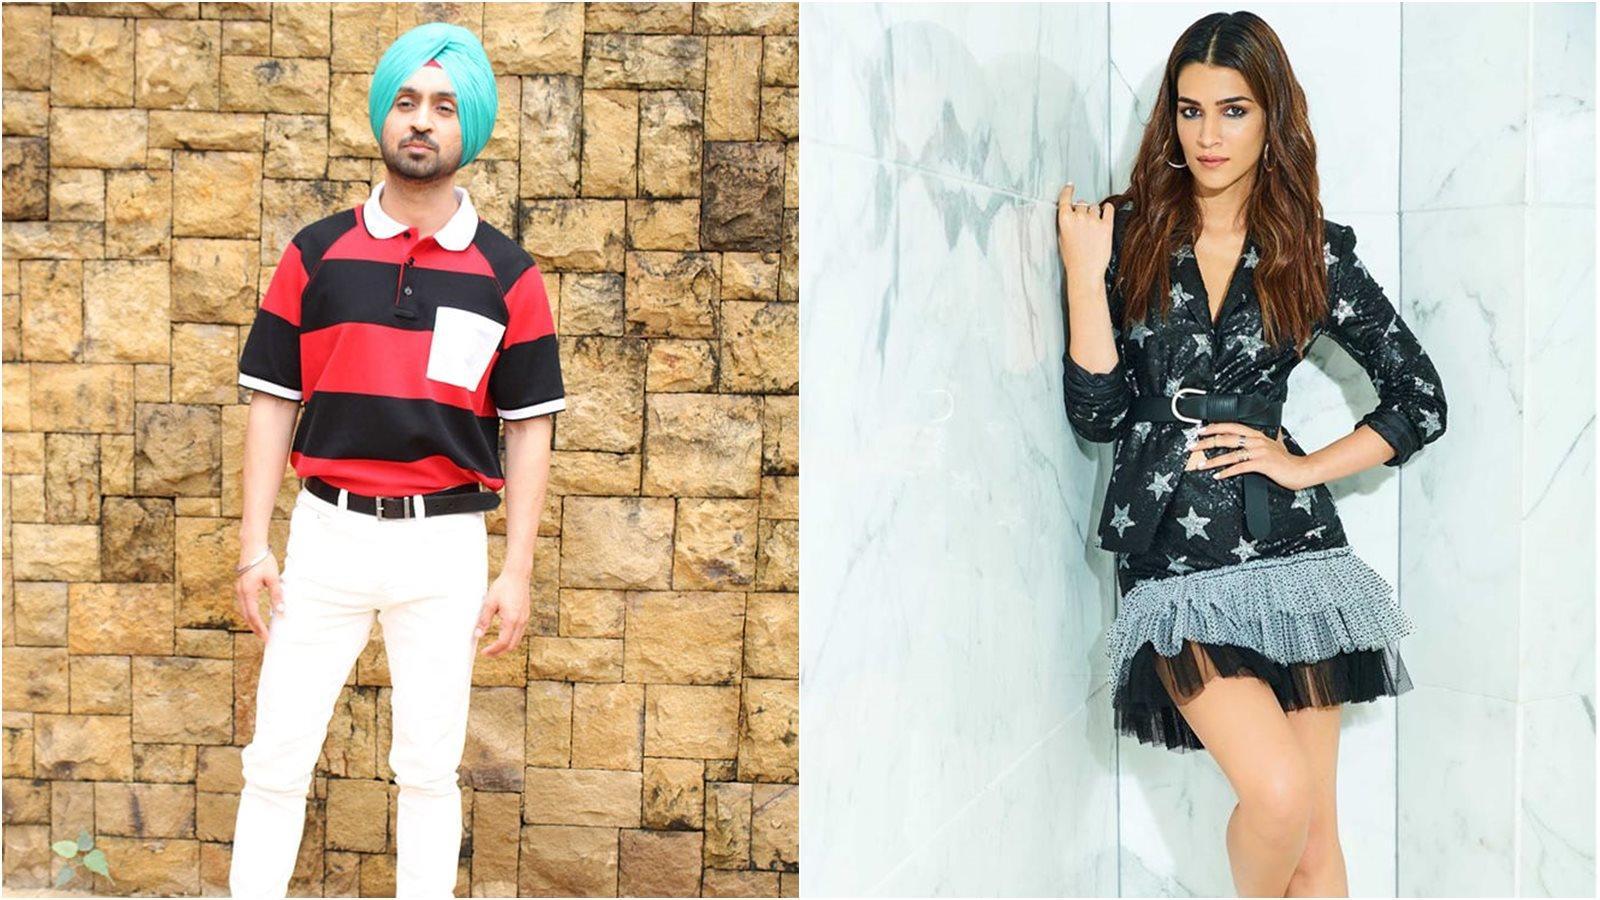 Diljit Dosanjh, Kriti Sanon promote upcoming film 'Arjun Patiala'